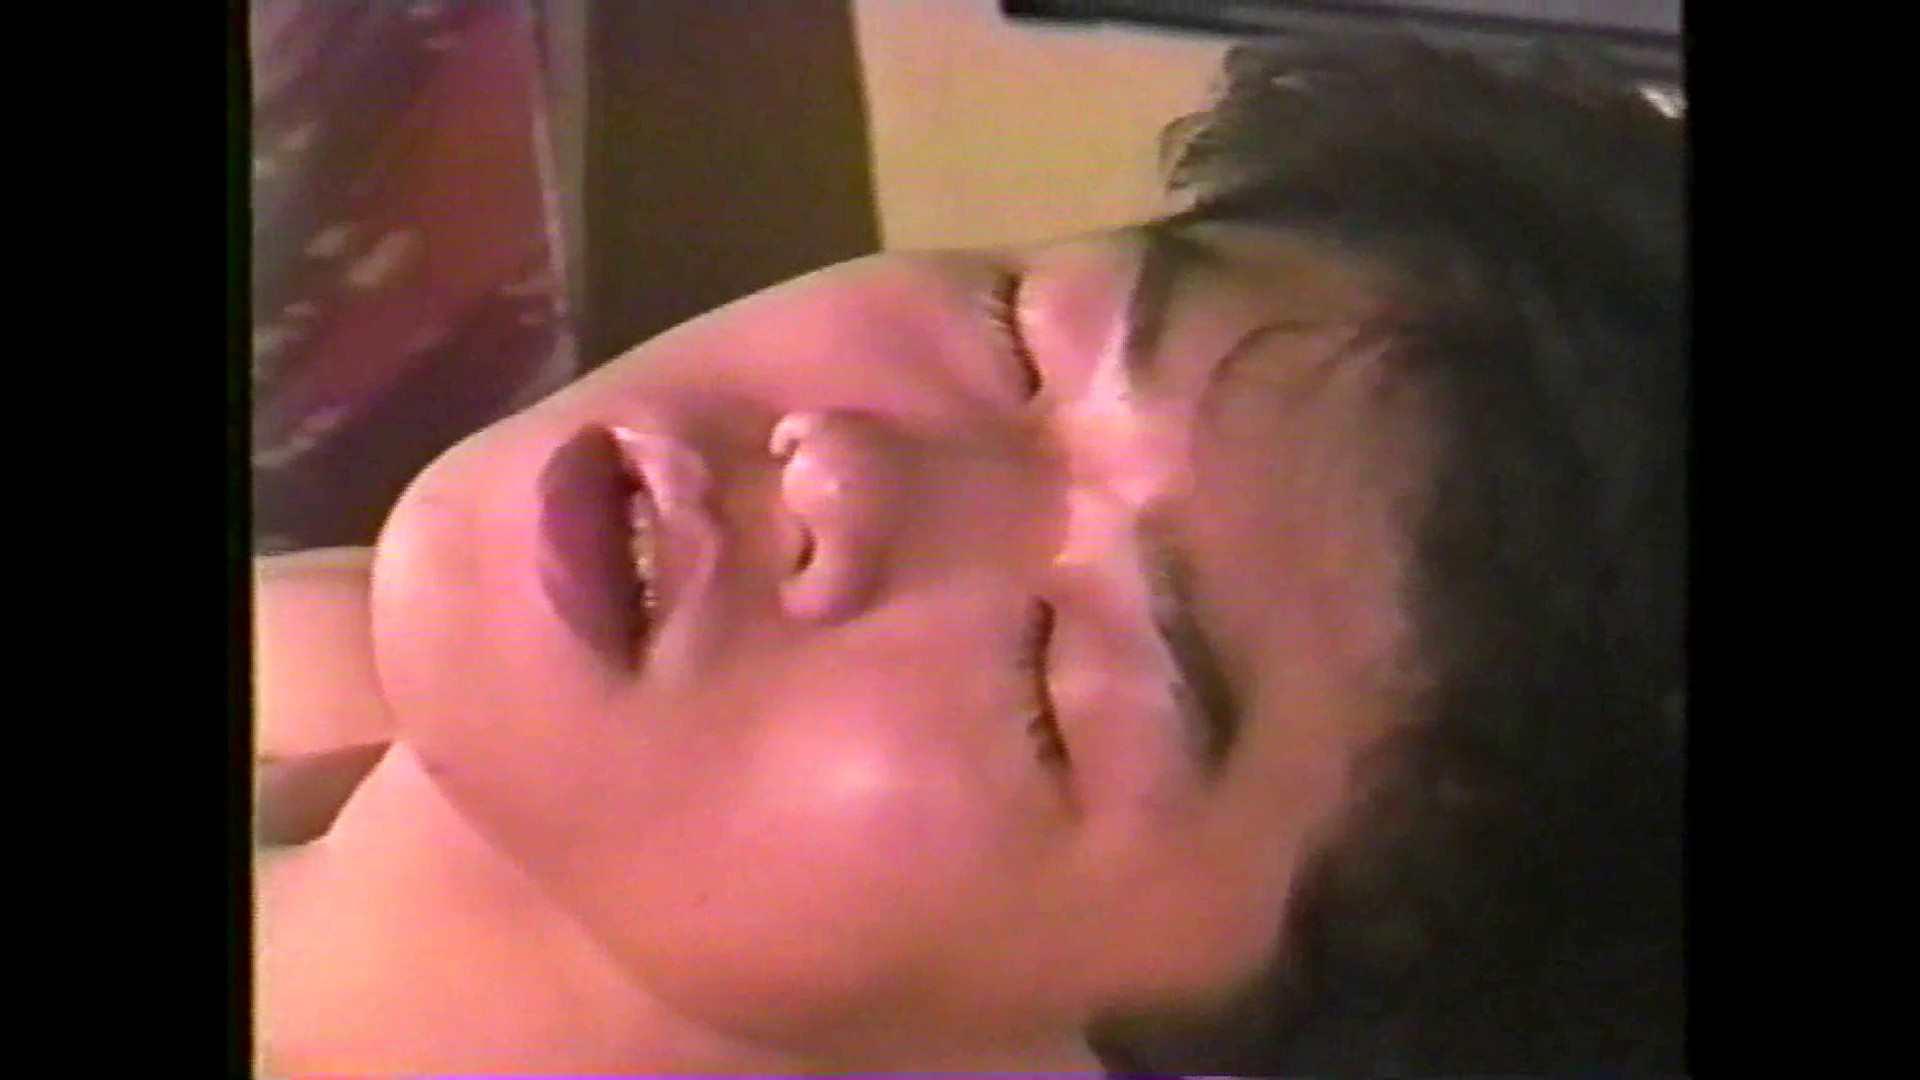 GAYBOY宏のオカズ倉庫Vol.2-2 完全無修正  63pic 44